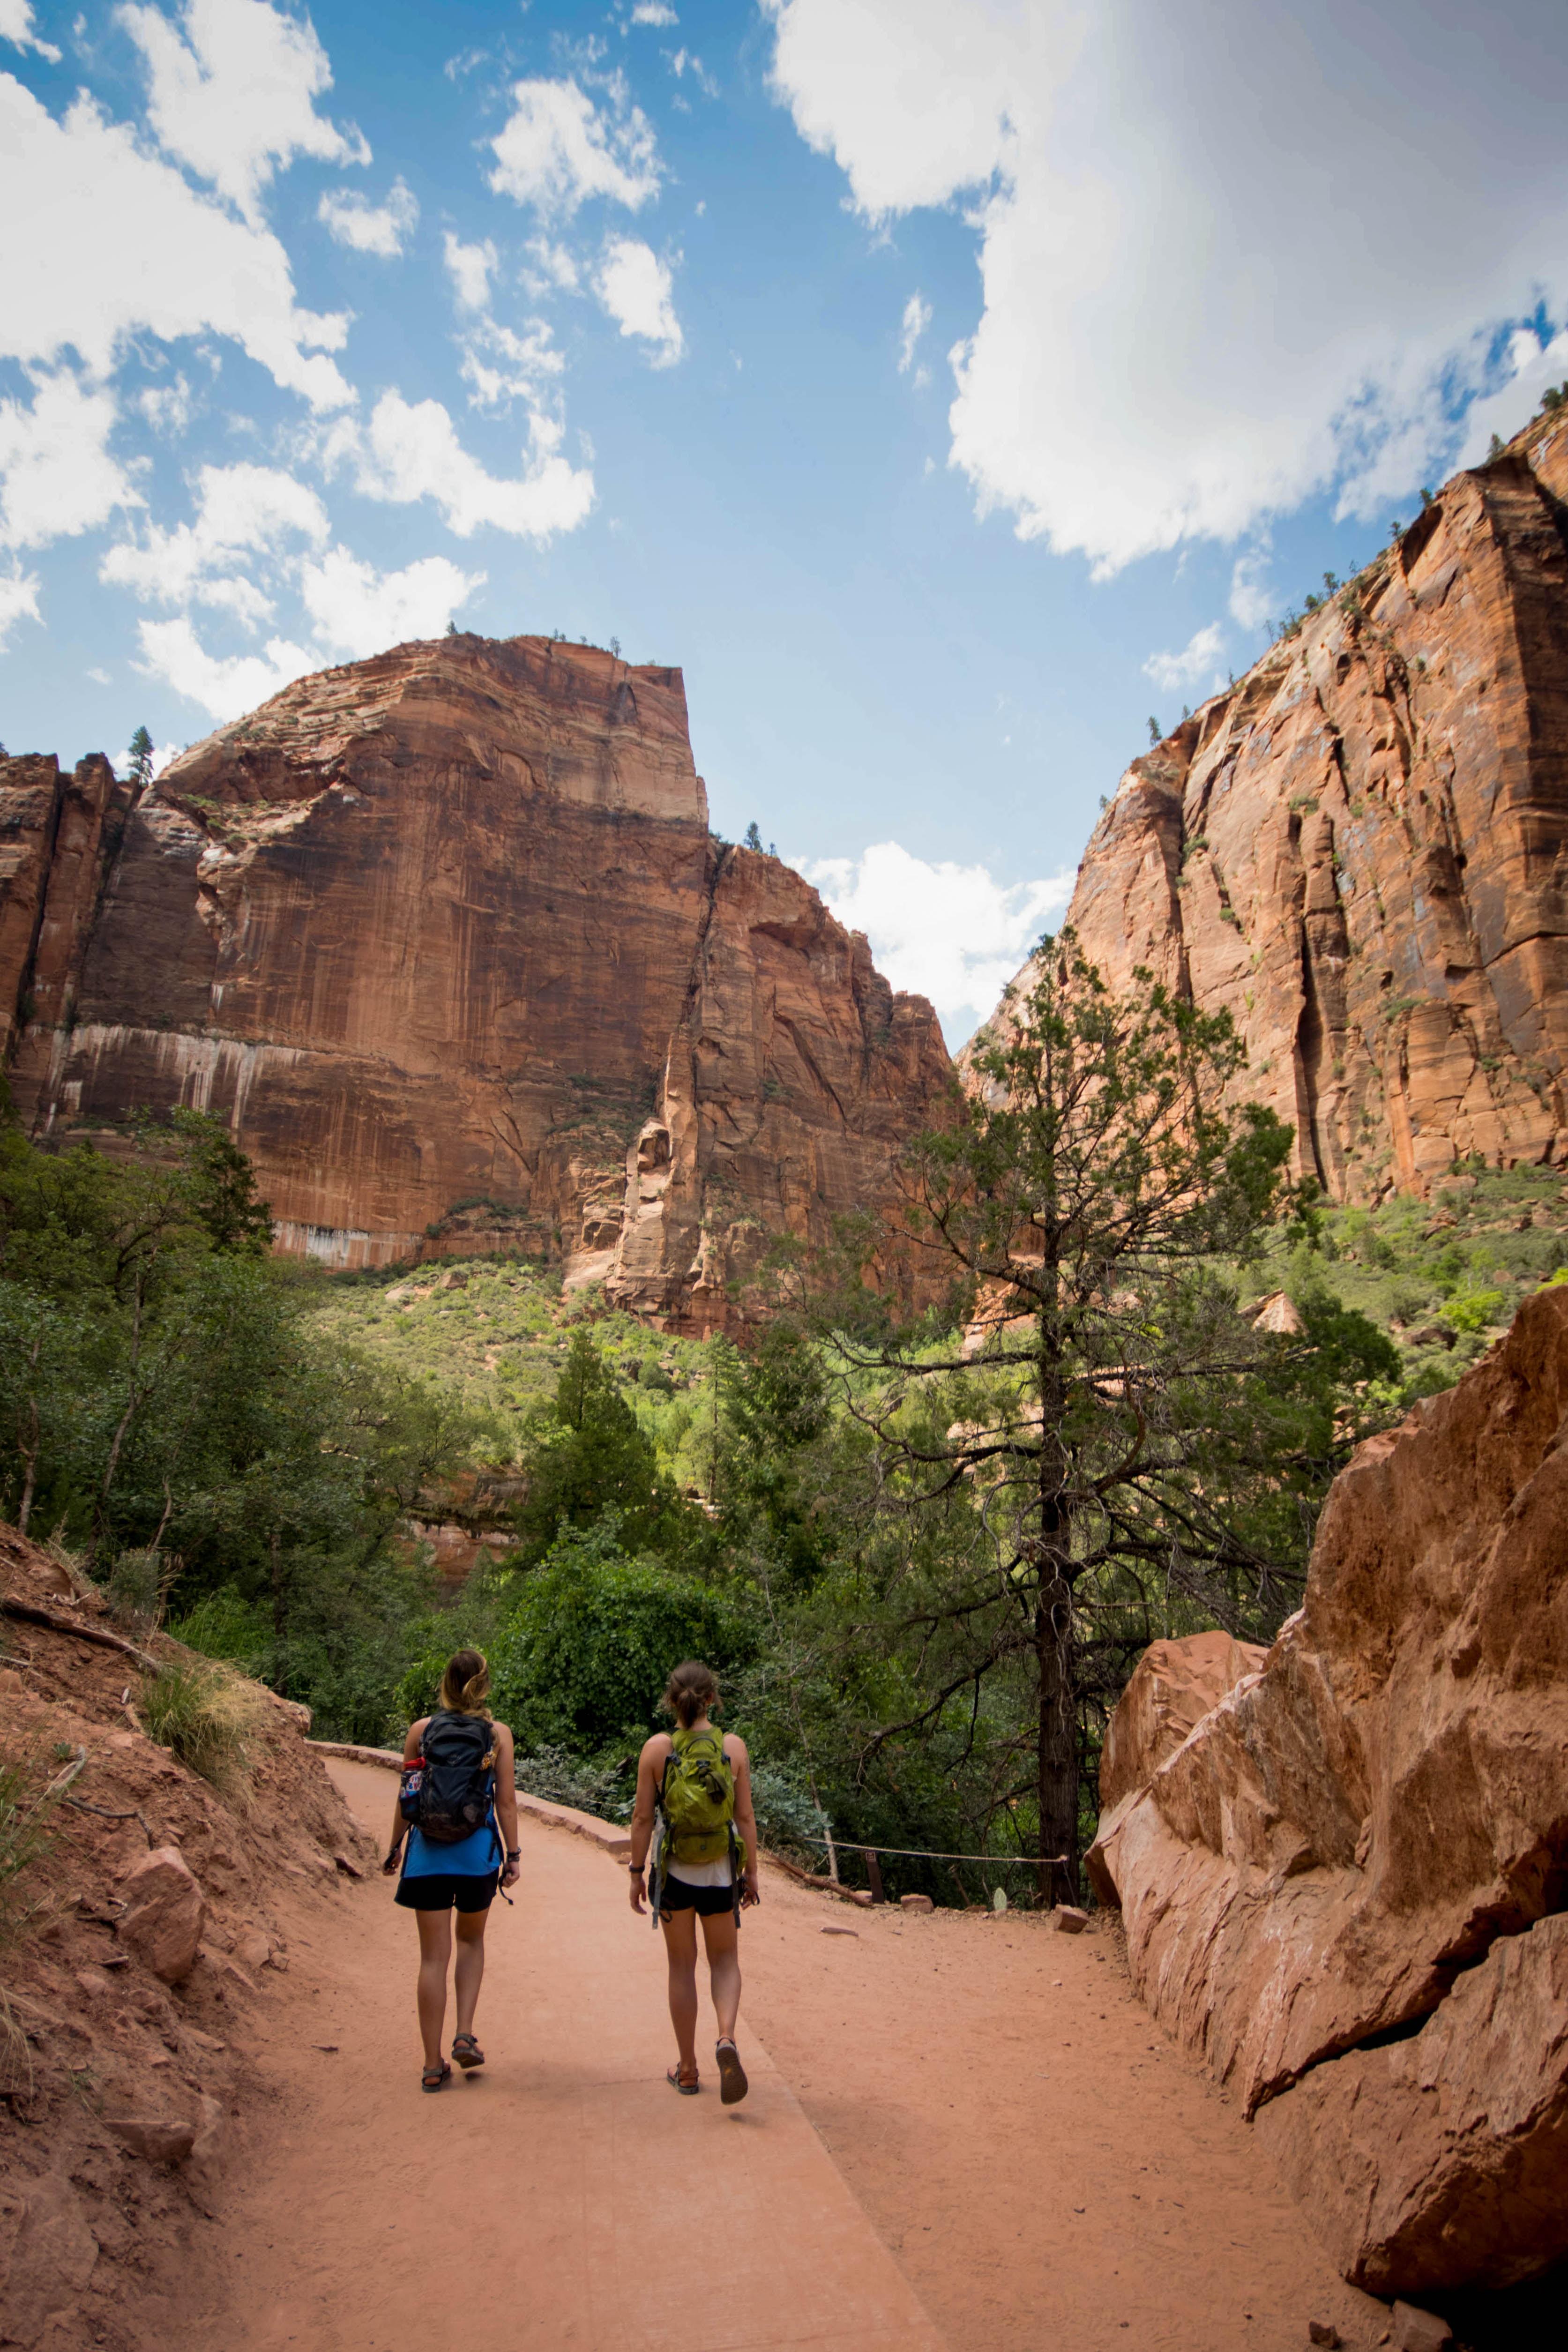 two women walking in front of trees